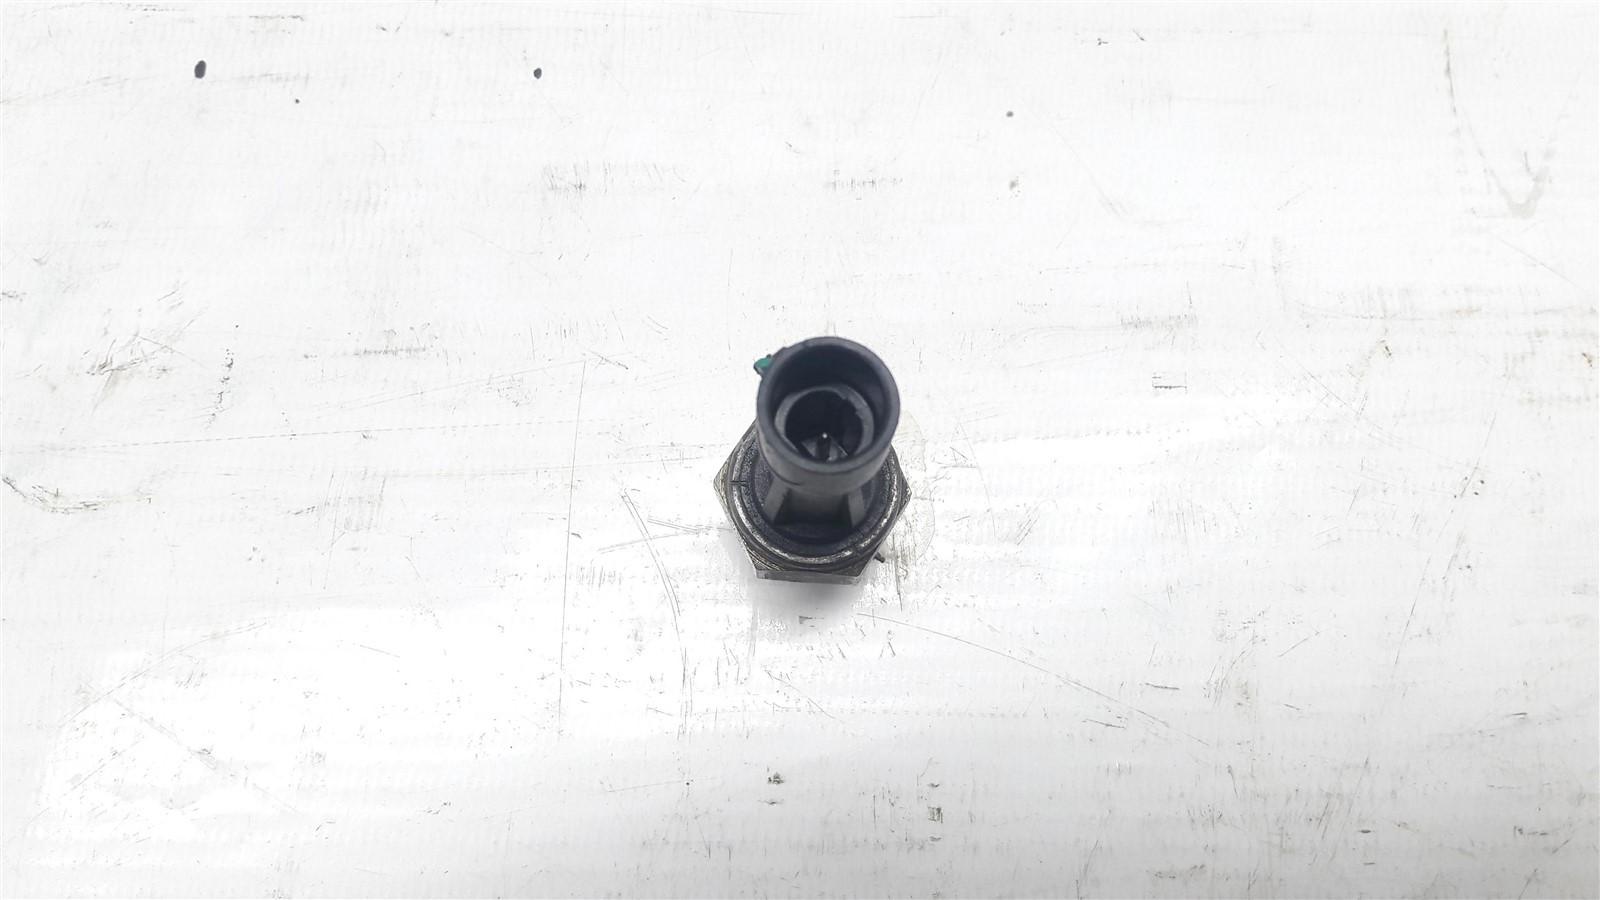 Interruptor oleo cebolinha Idea Linea Marea doblo fiorino 1.8 e-torq